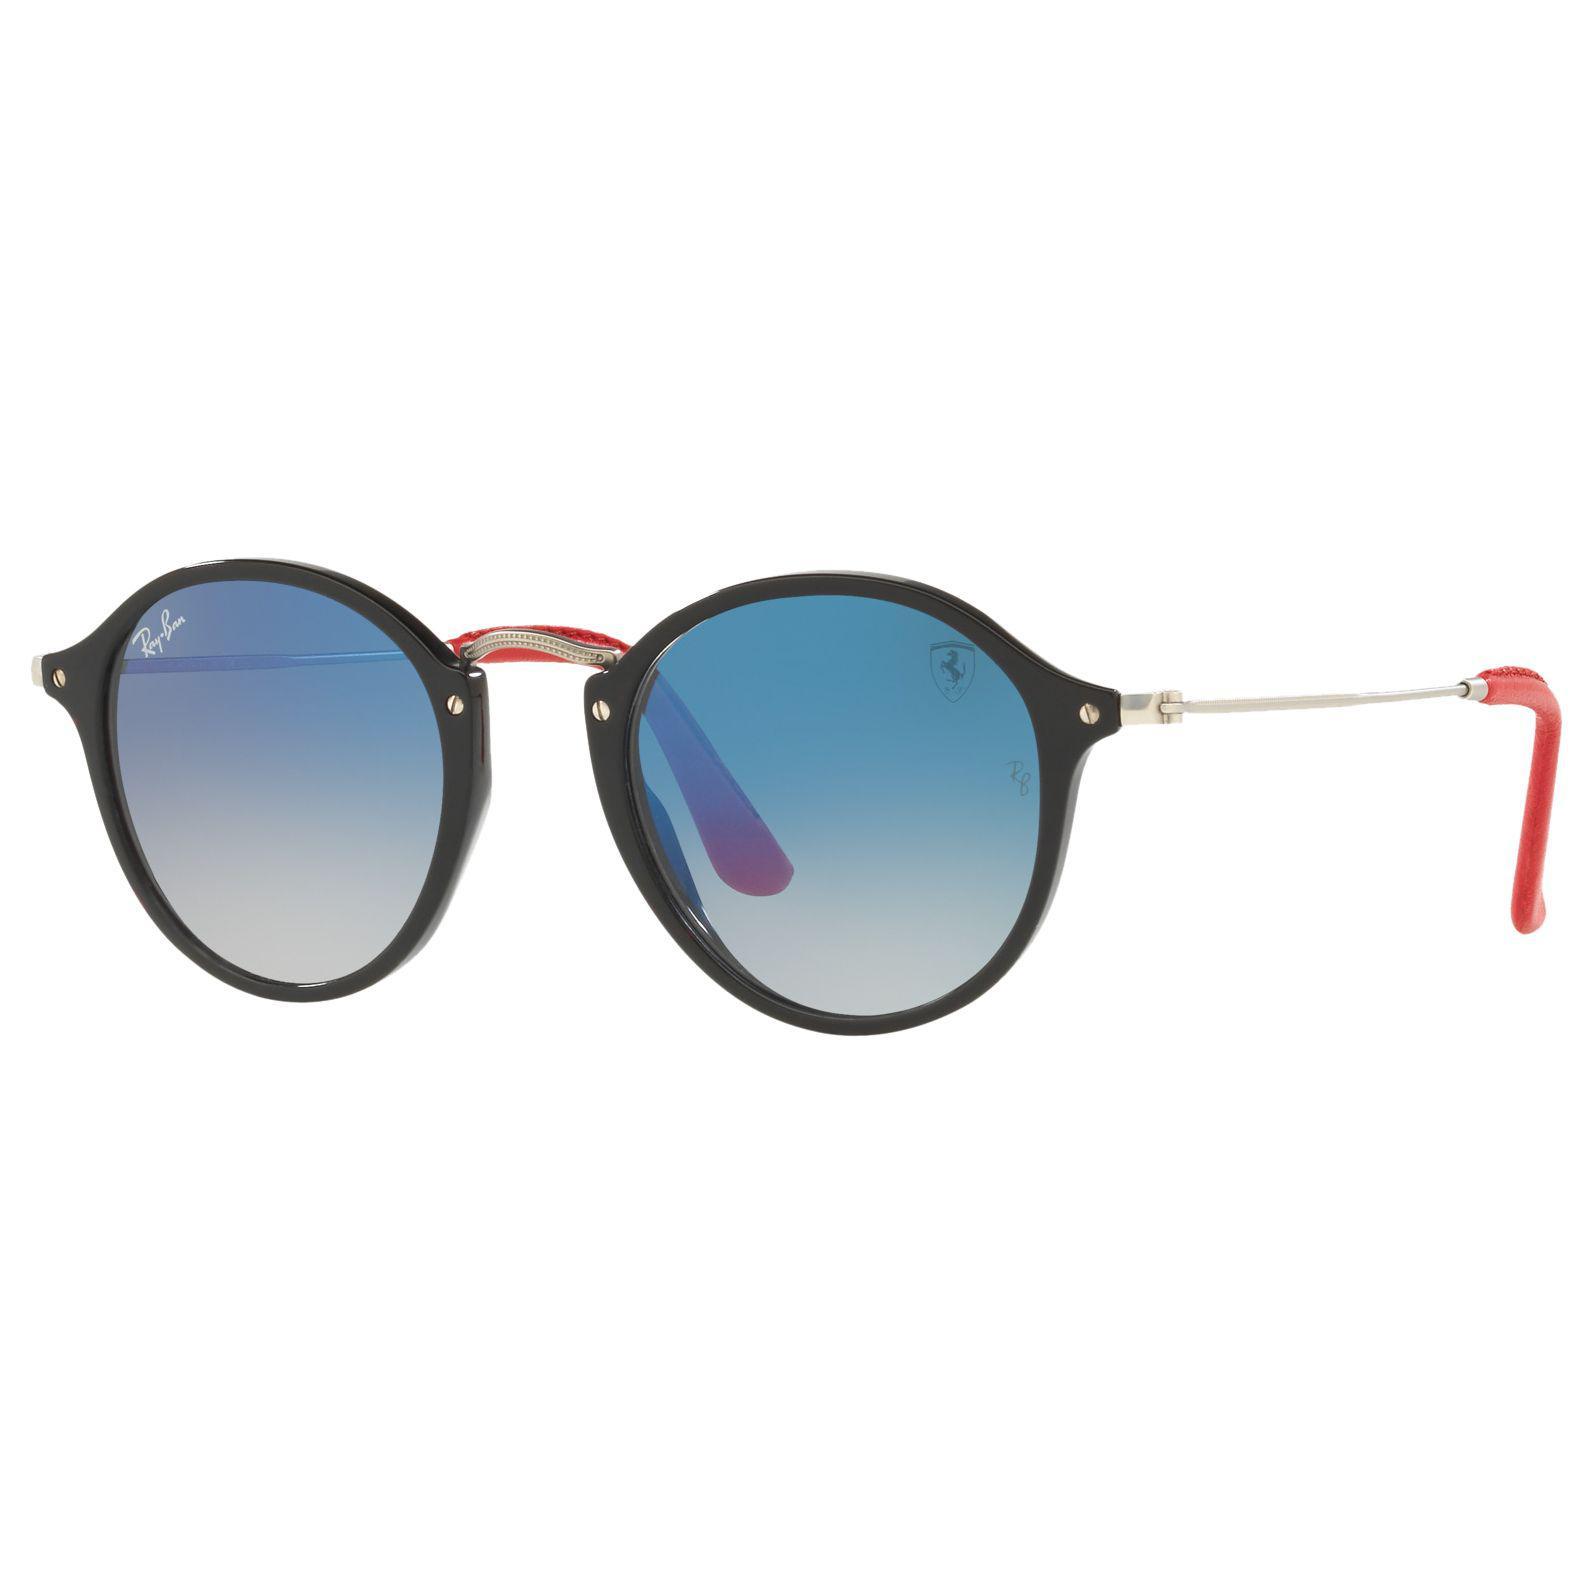 4c39cd58ce Ray-Ban Rb2447nm Scuderia Ferrari Round Sunglasses in Blue for Men ...